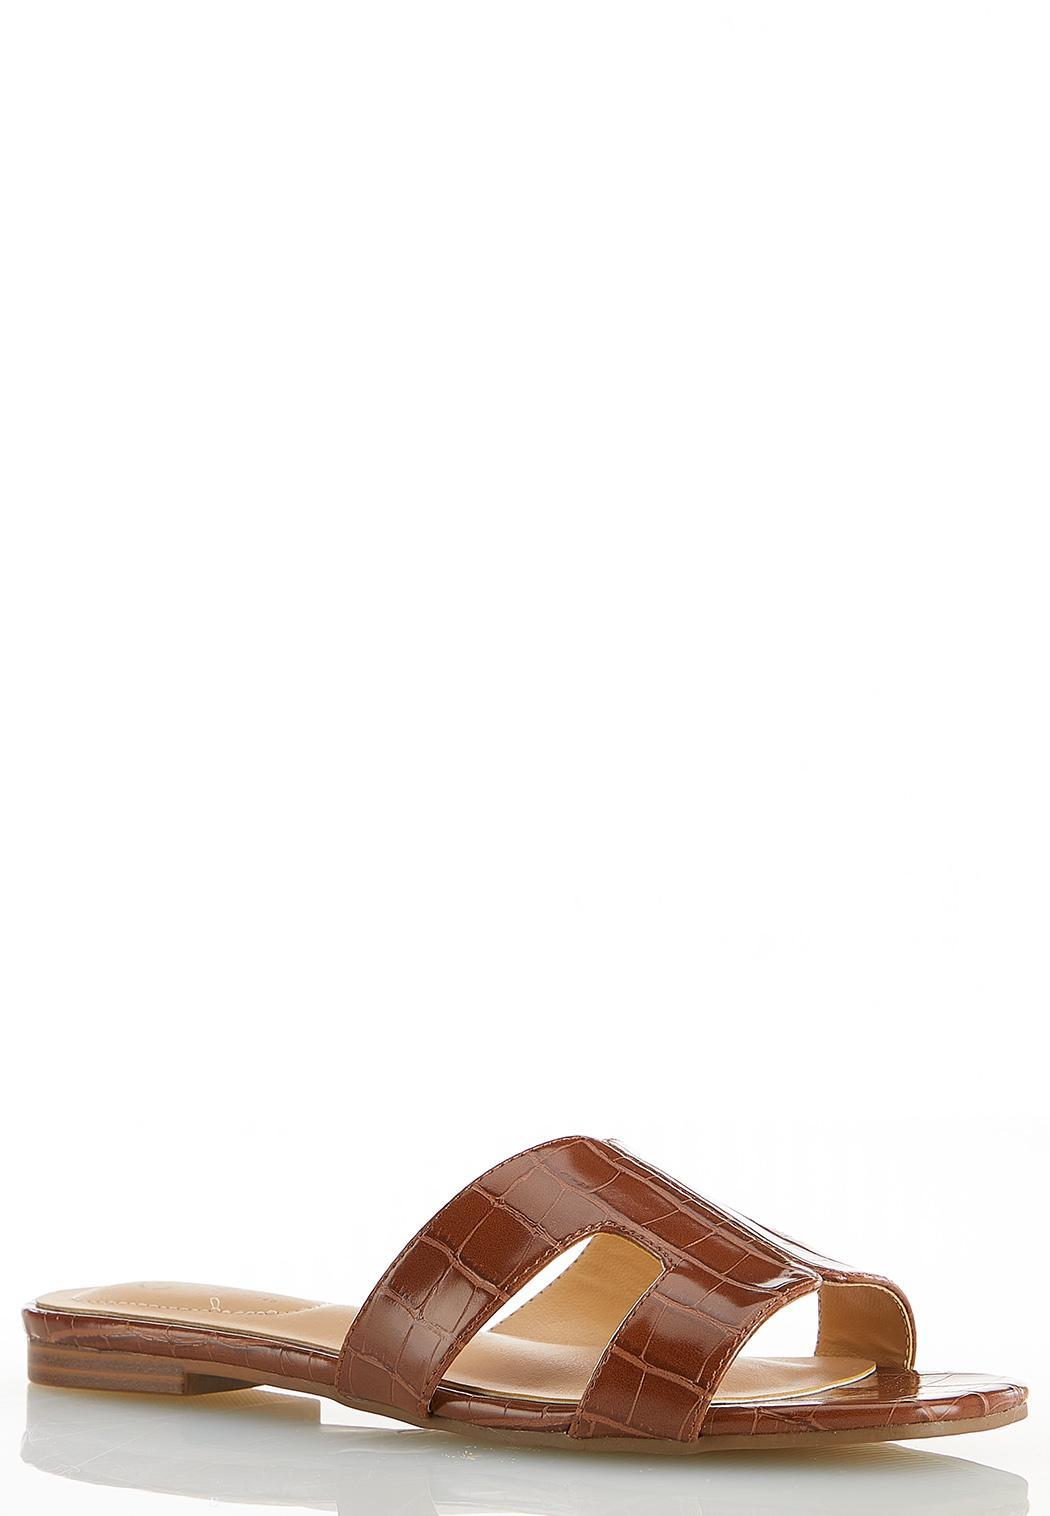 Croc H-Band Slide Sandals